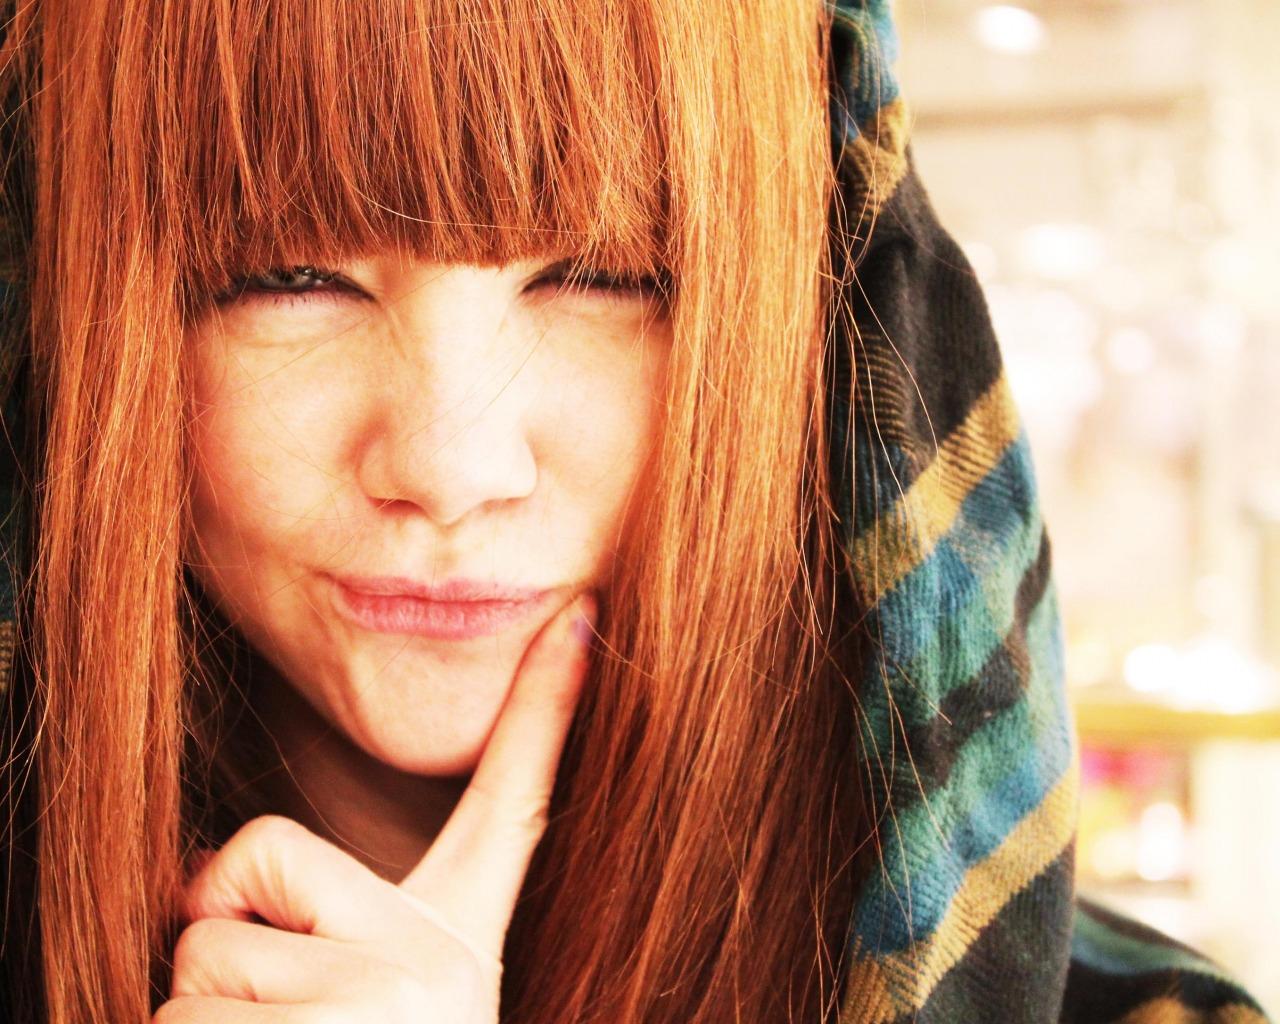 Фото красивых девушек (111 фото красавиц)